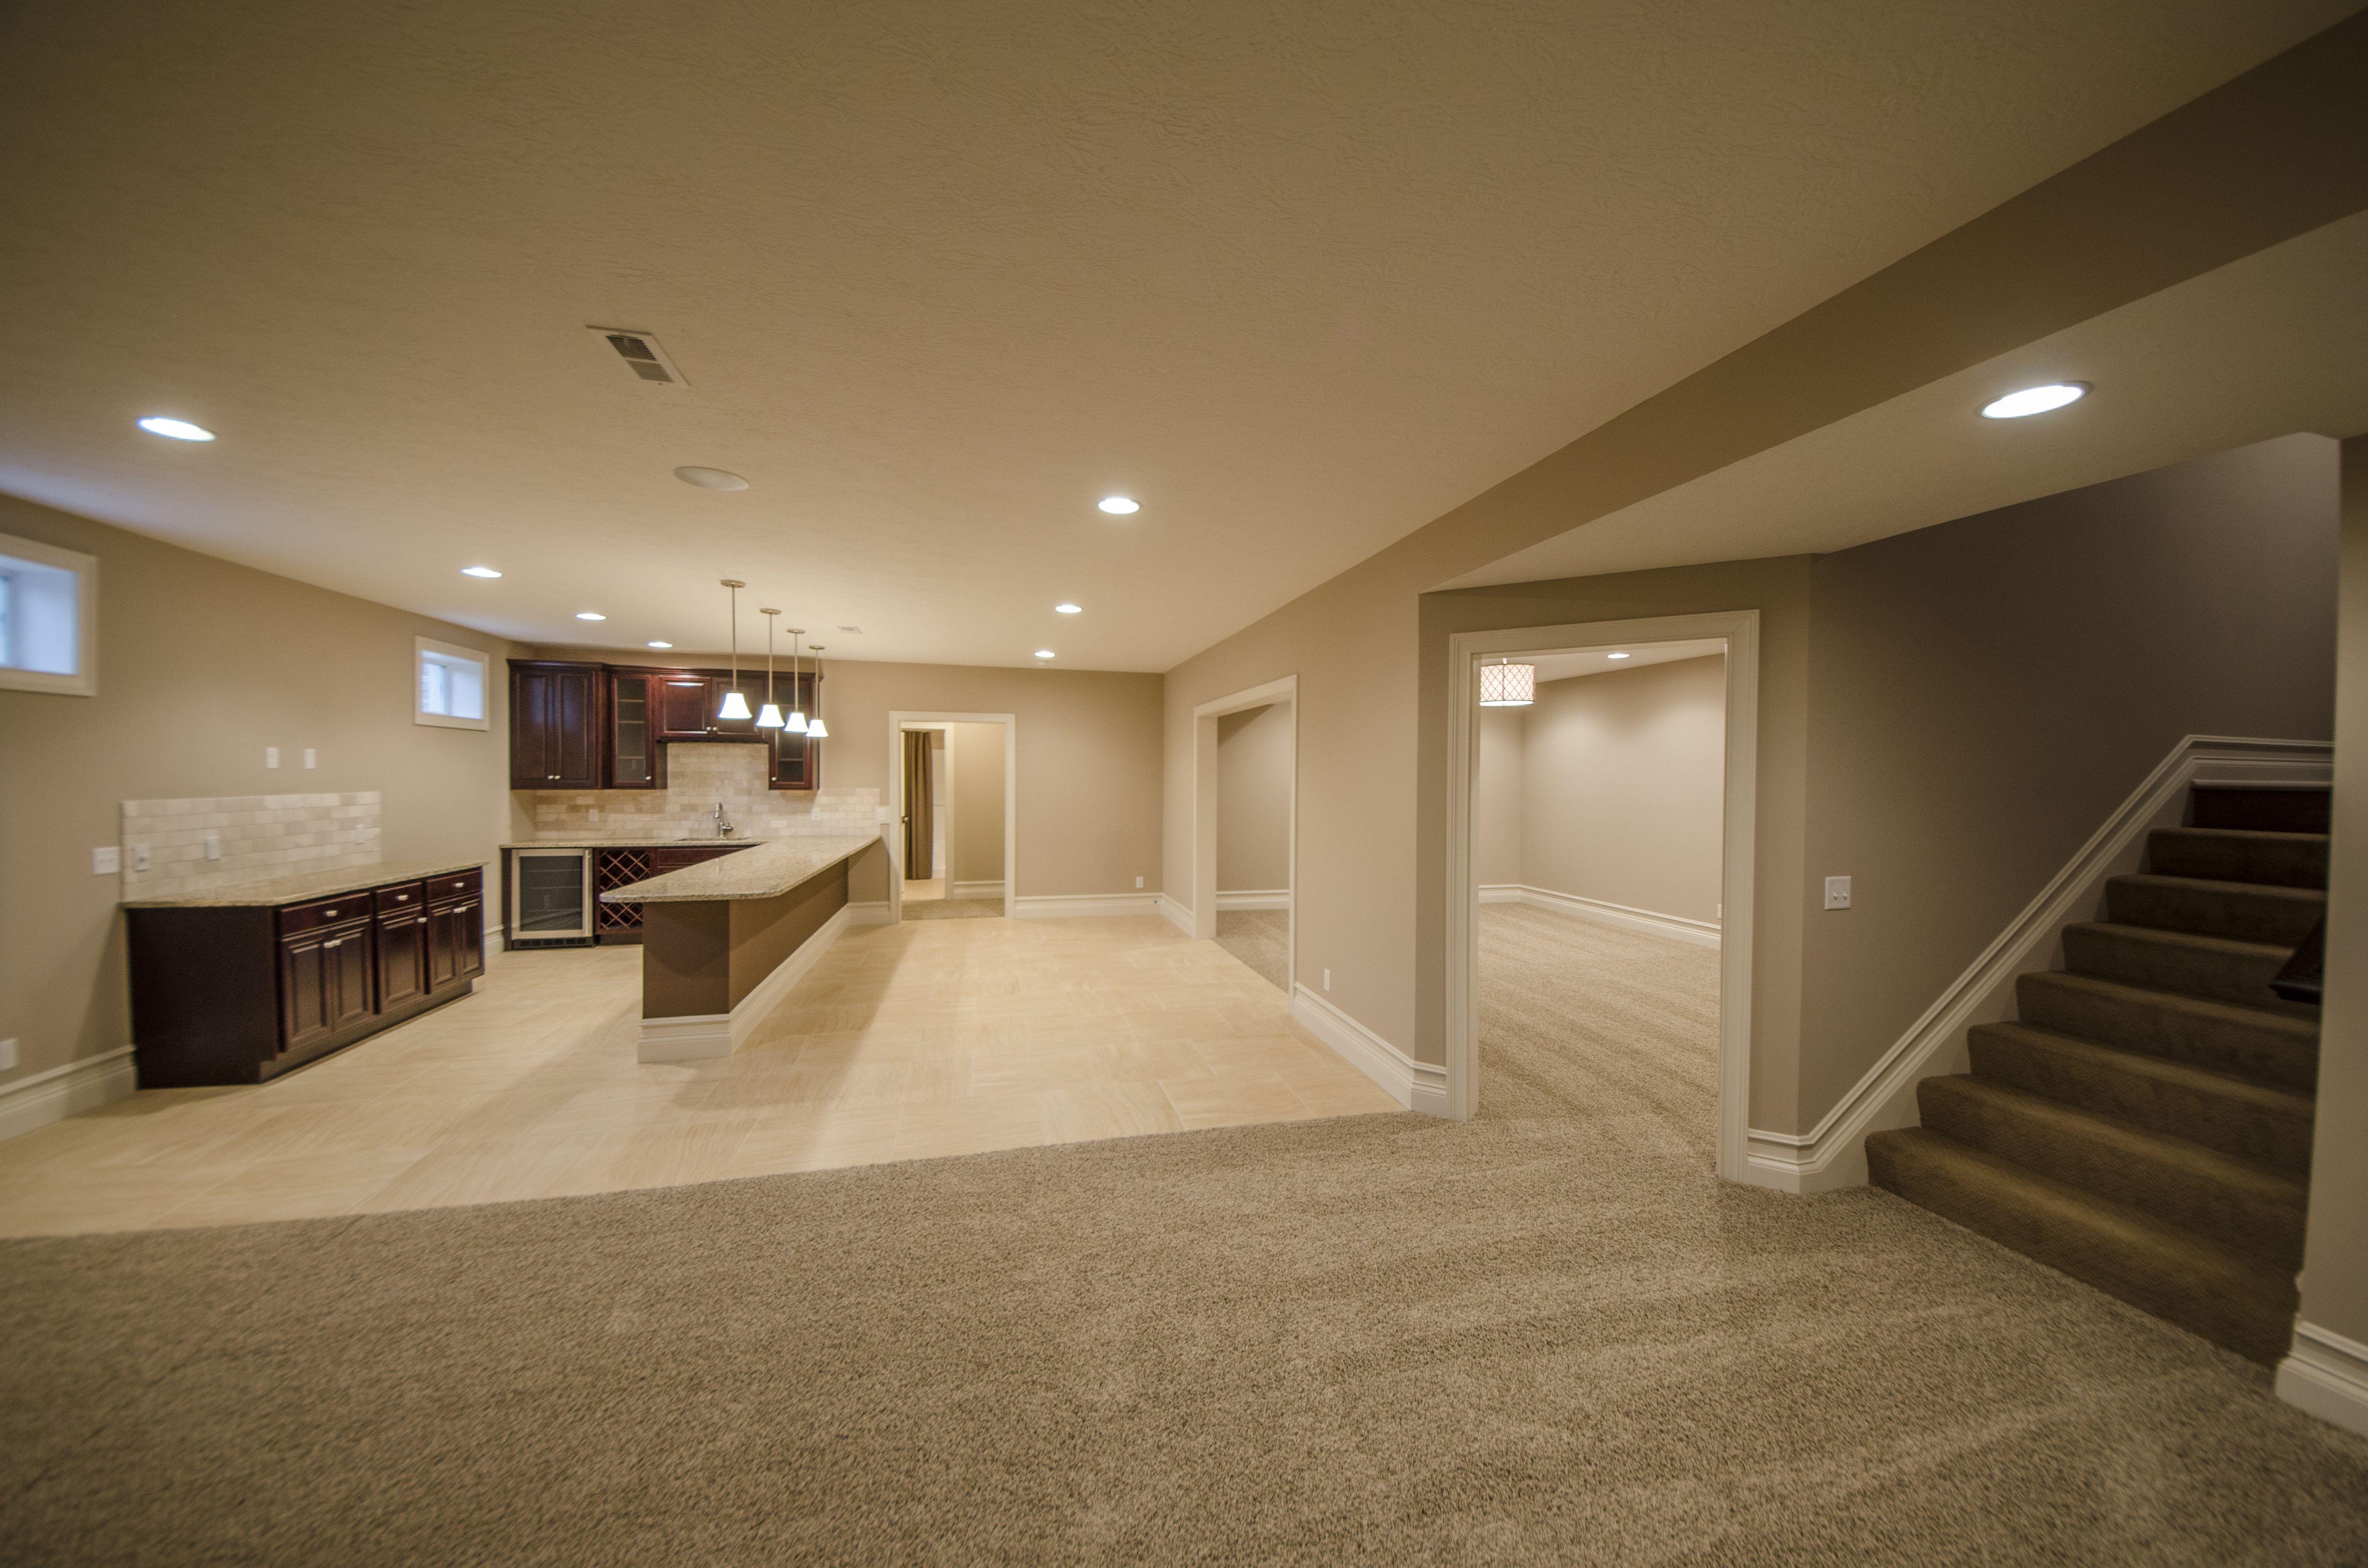 Custom Basement Built By Design Homes & Development Co